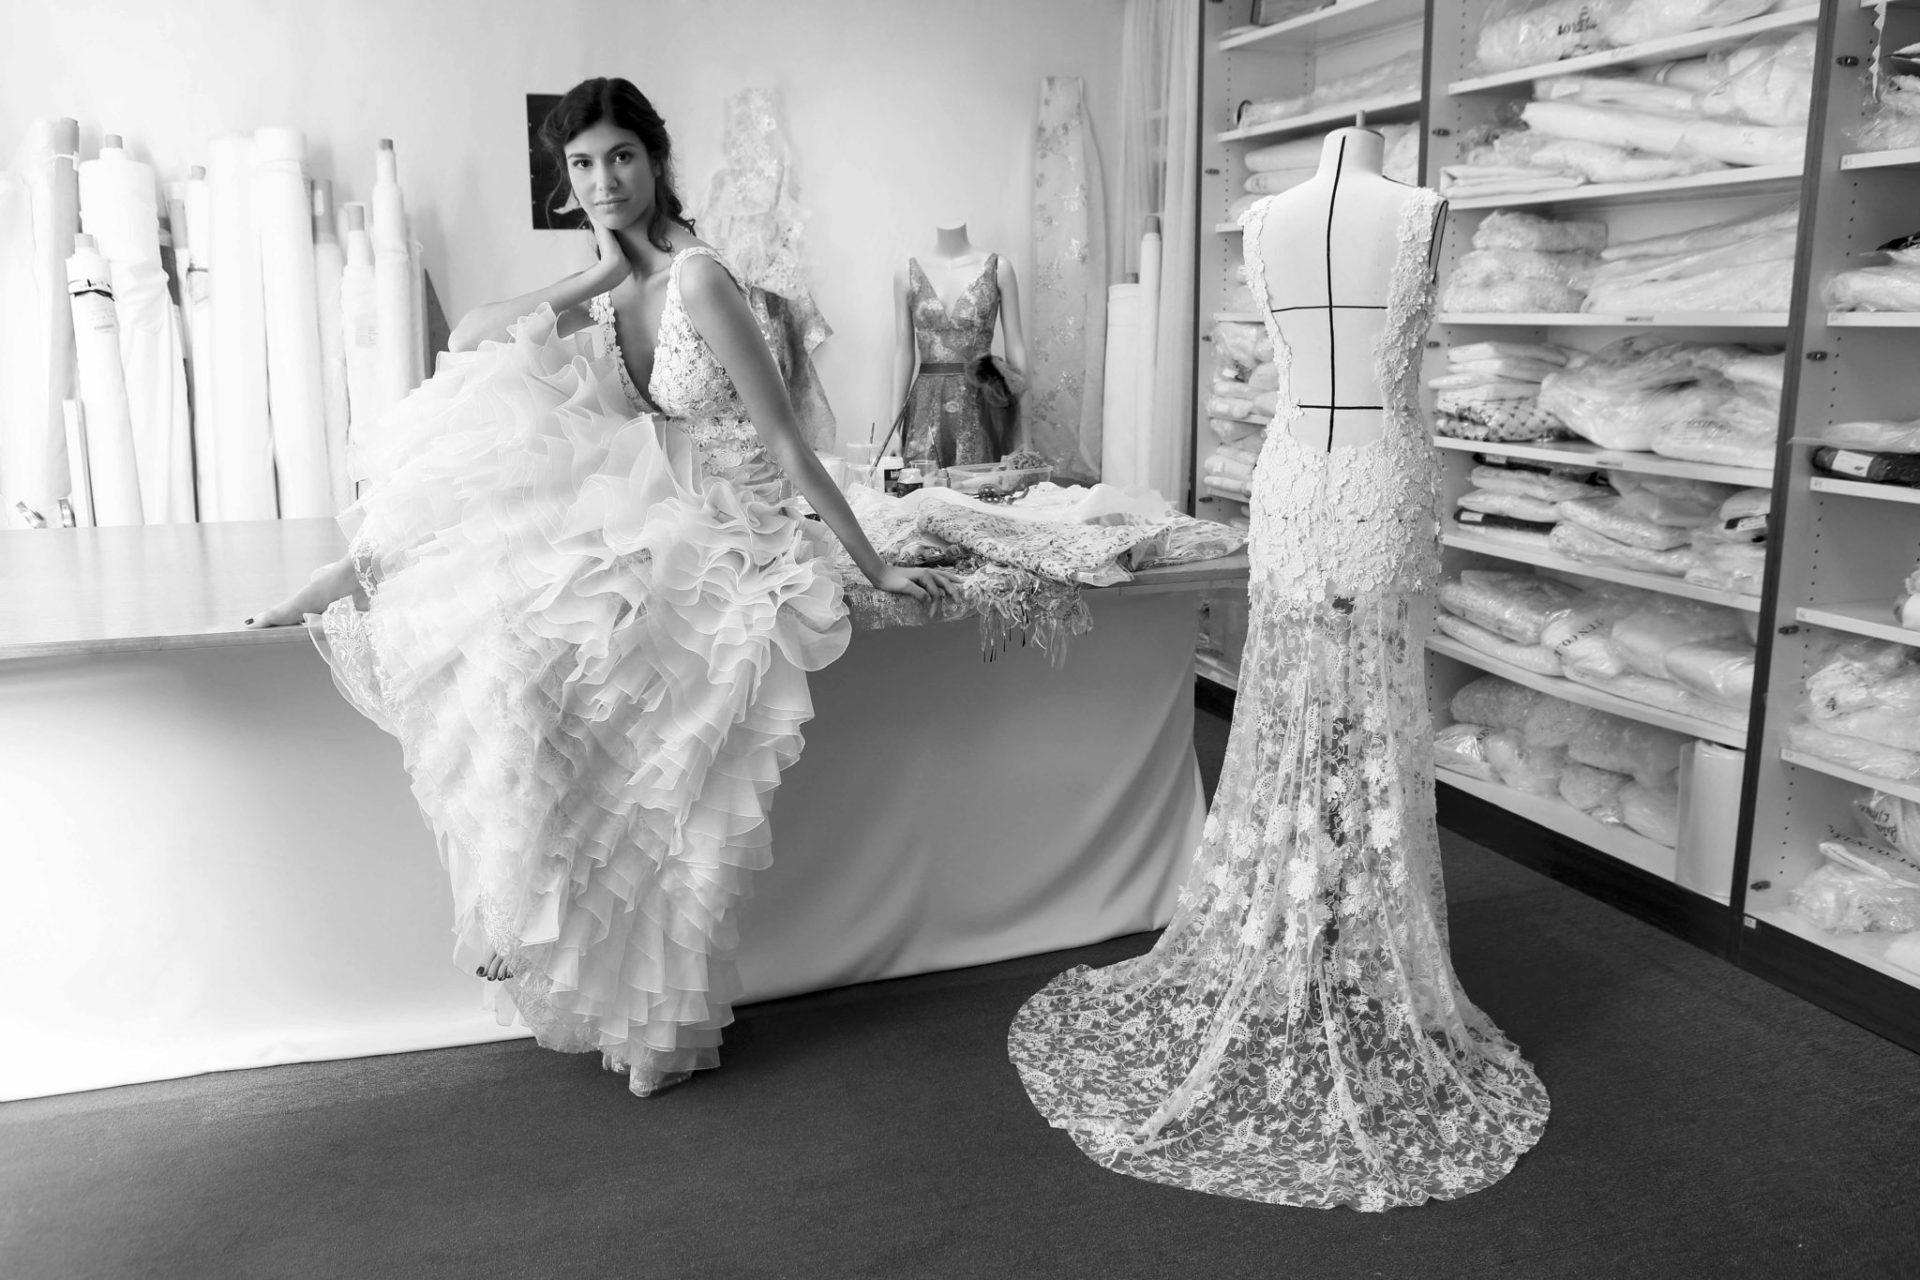 91a1535f2f8 Wedding dresses collection 2019 - Cymbeline - Robes de mariée ...